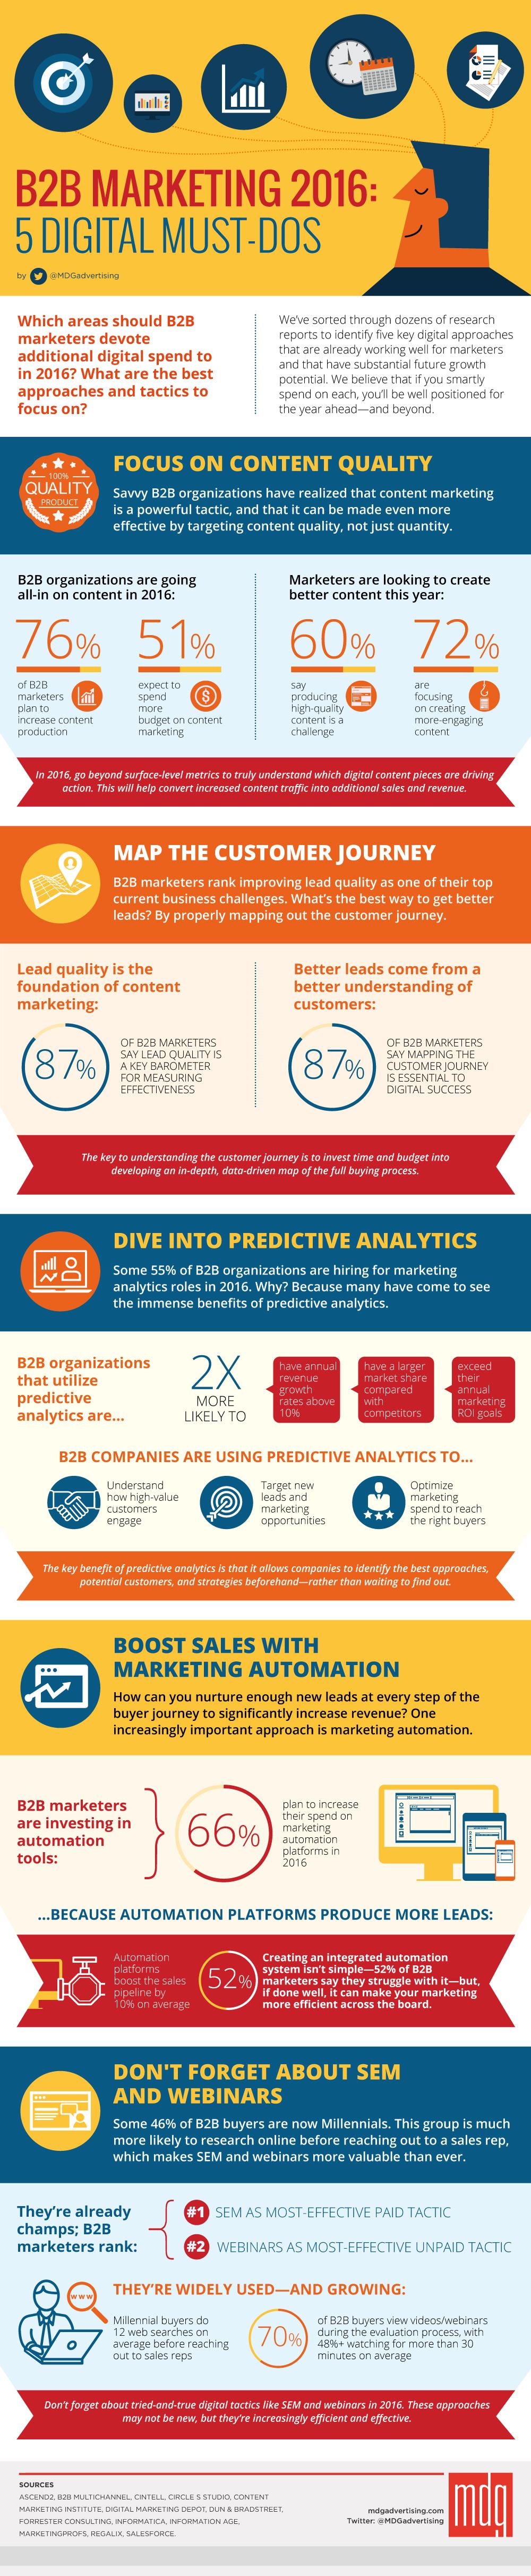 B2B Marketing 2016: 5 Digital Must-Dos [Infographic]